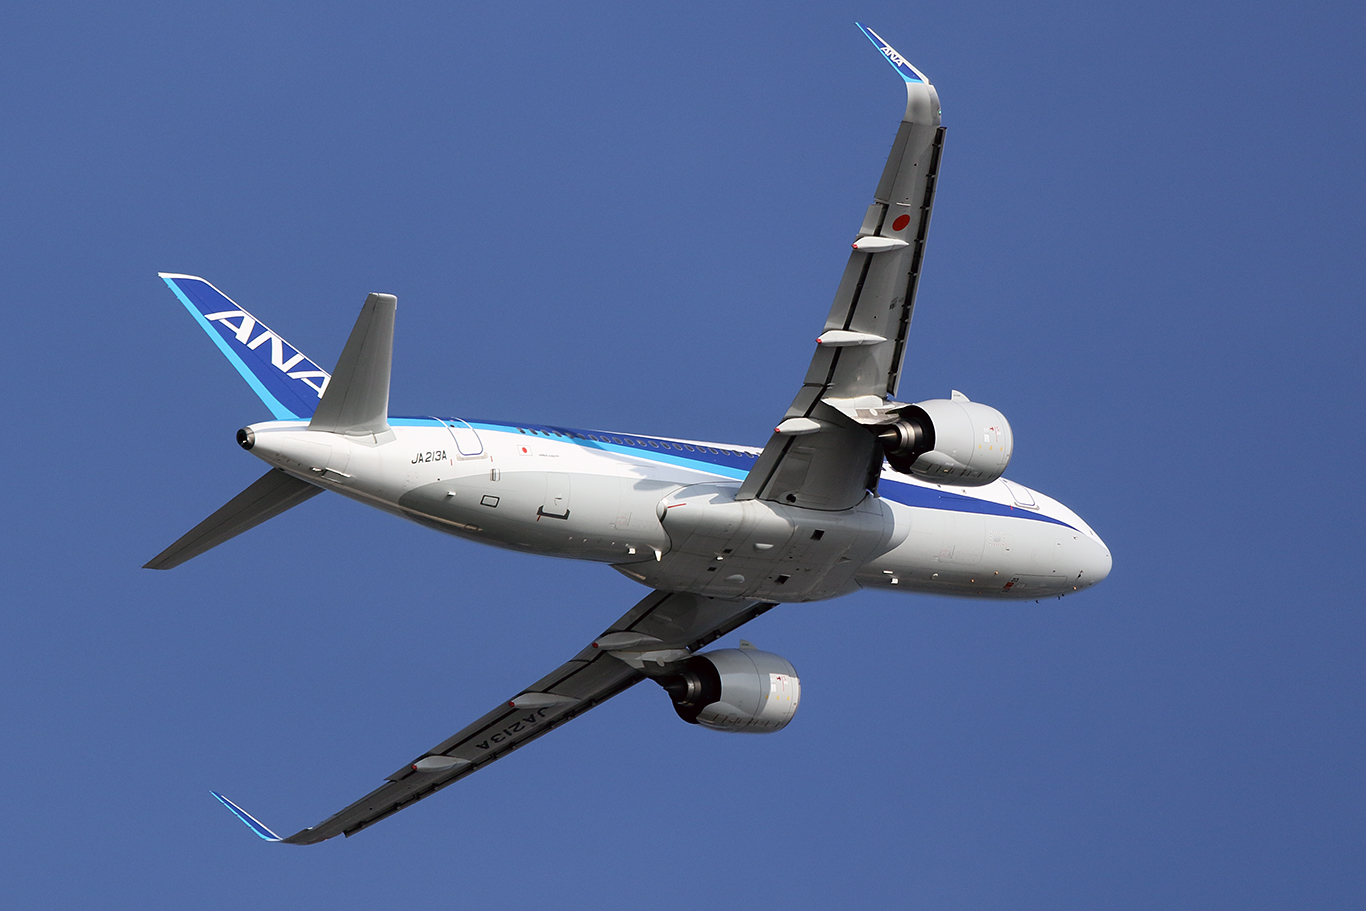 NH/ANA/全日空 NH567 A320Neo JA213A